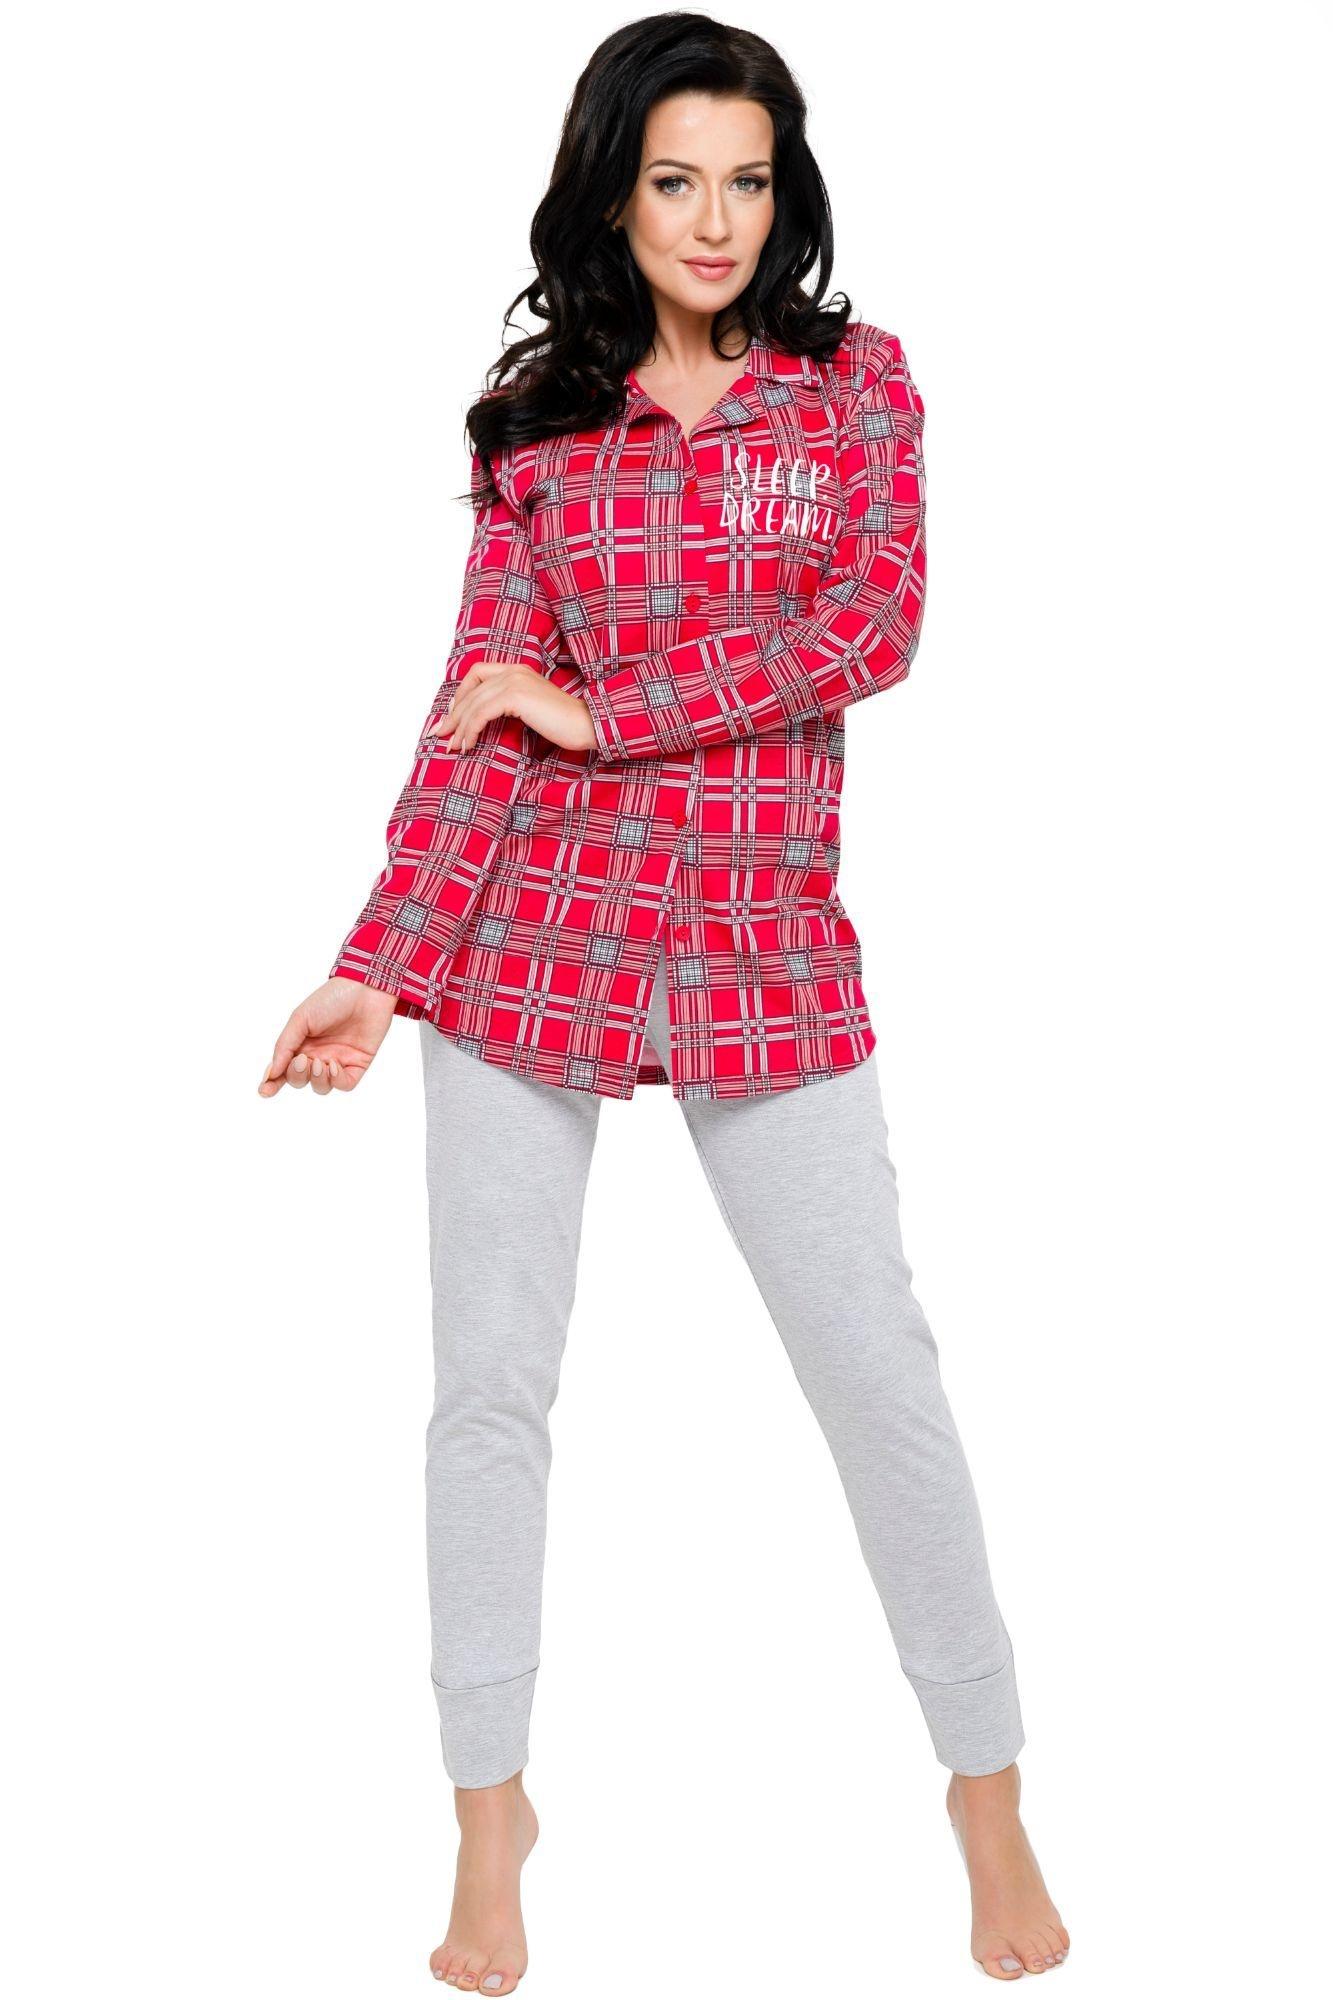 1d0aa5a947c1 Dámské bavlněné pyžamo Dalia červené káro s dlouhými rukávy